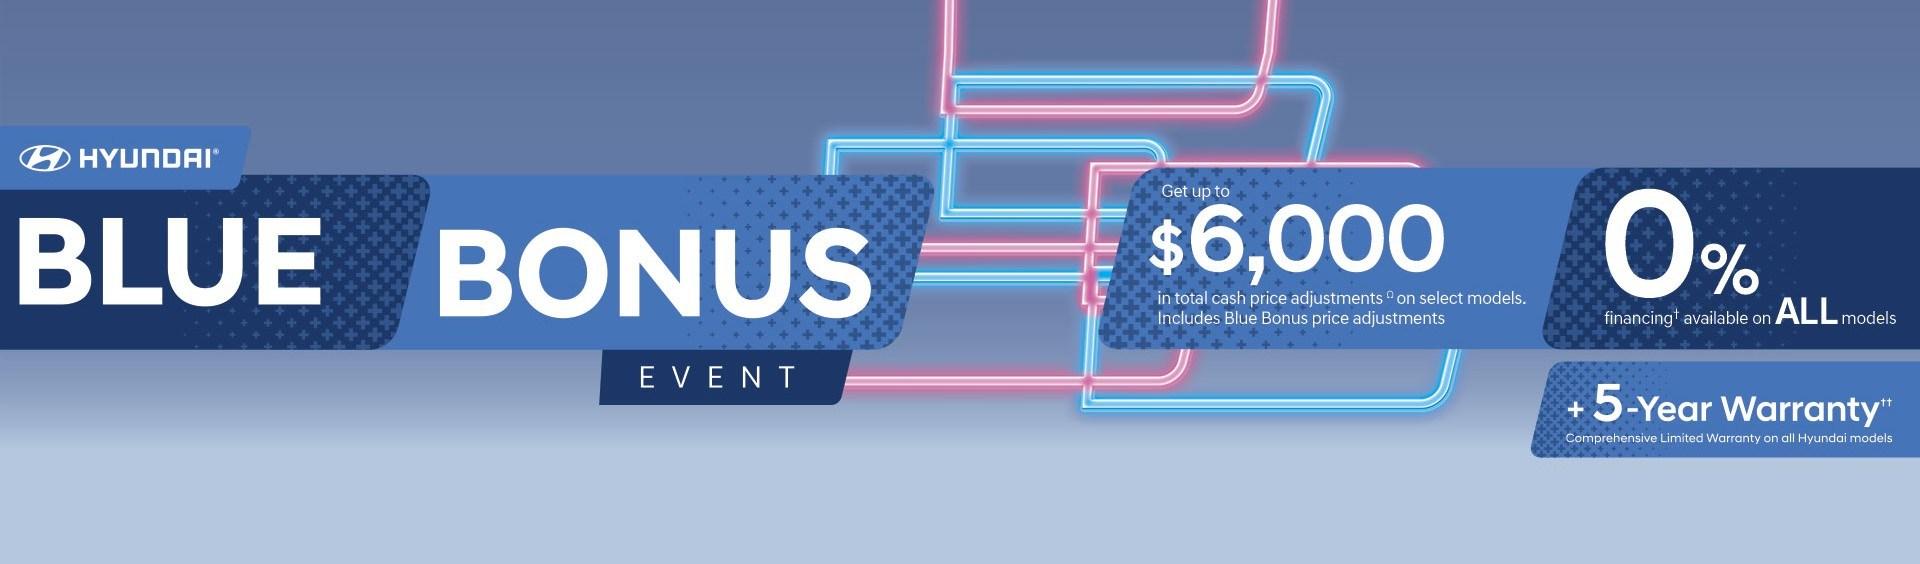 Hyundai Blue Bonus Event